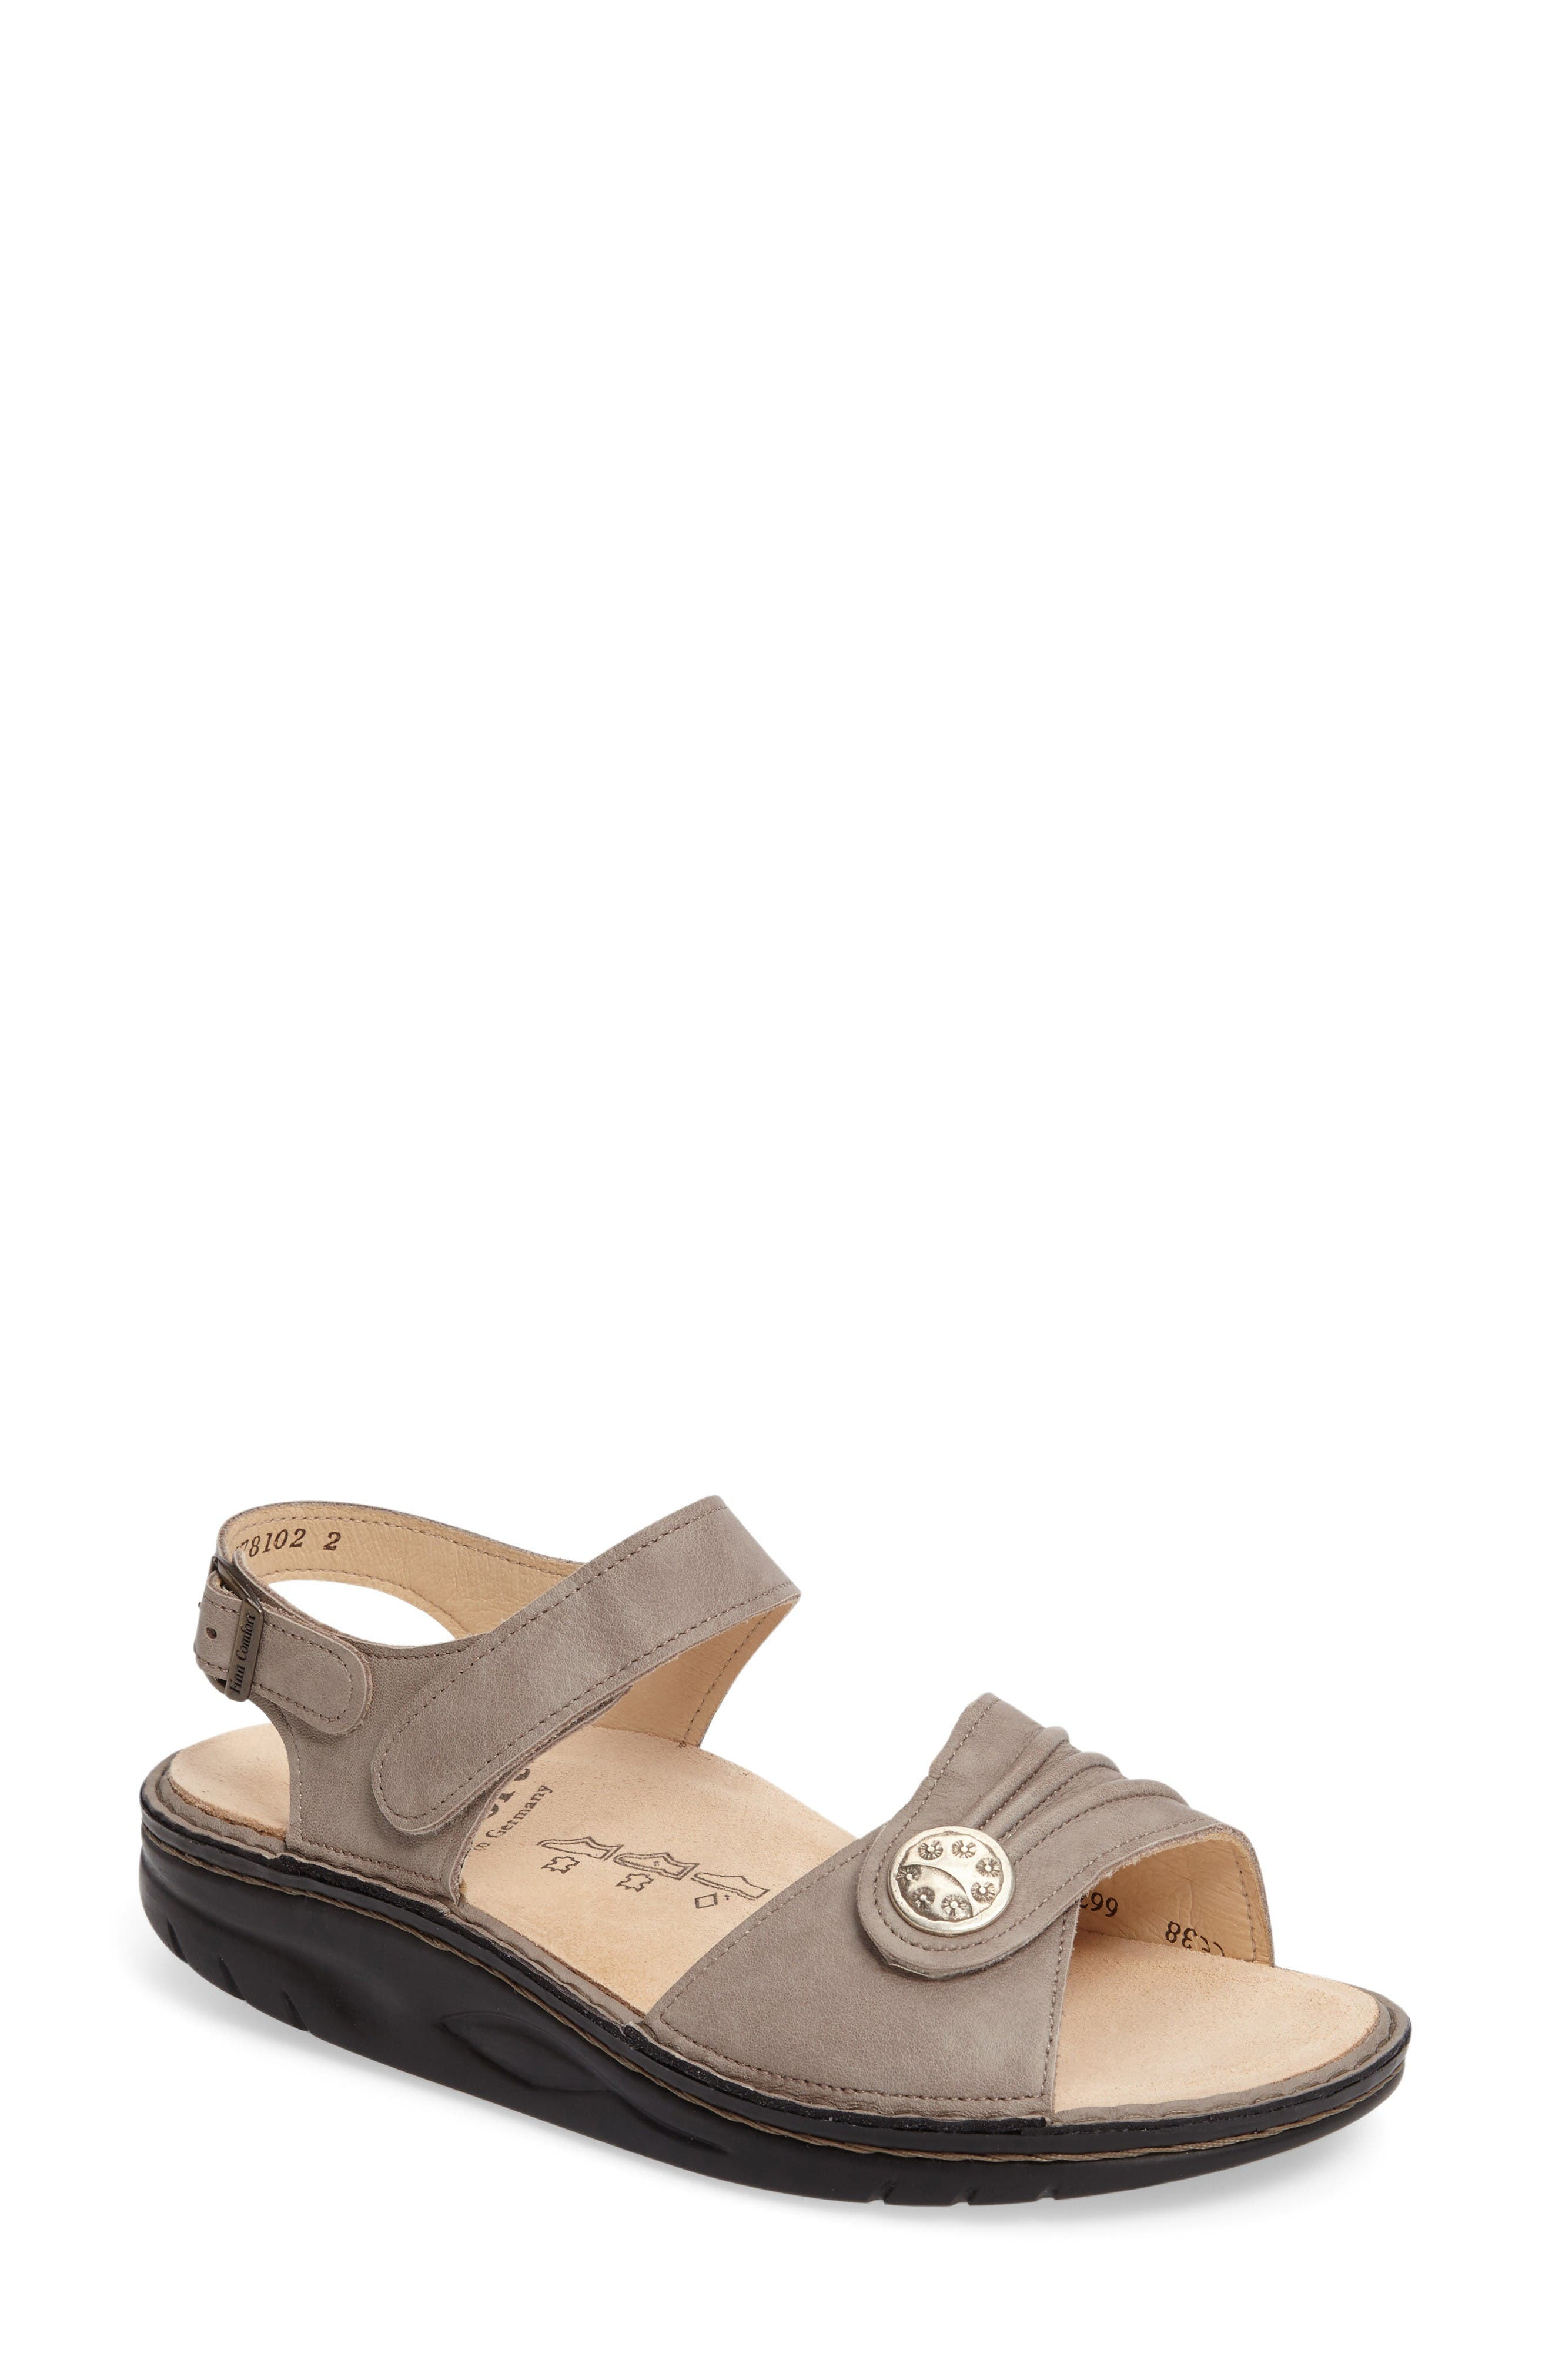 FINNAMIC by Finn Comfort 'Sausalito' Sandal